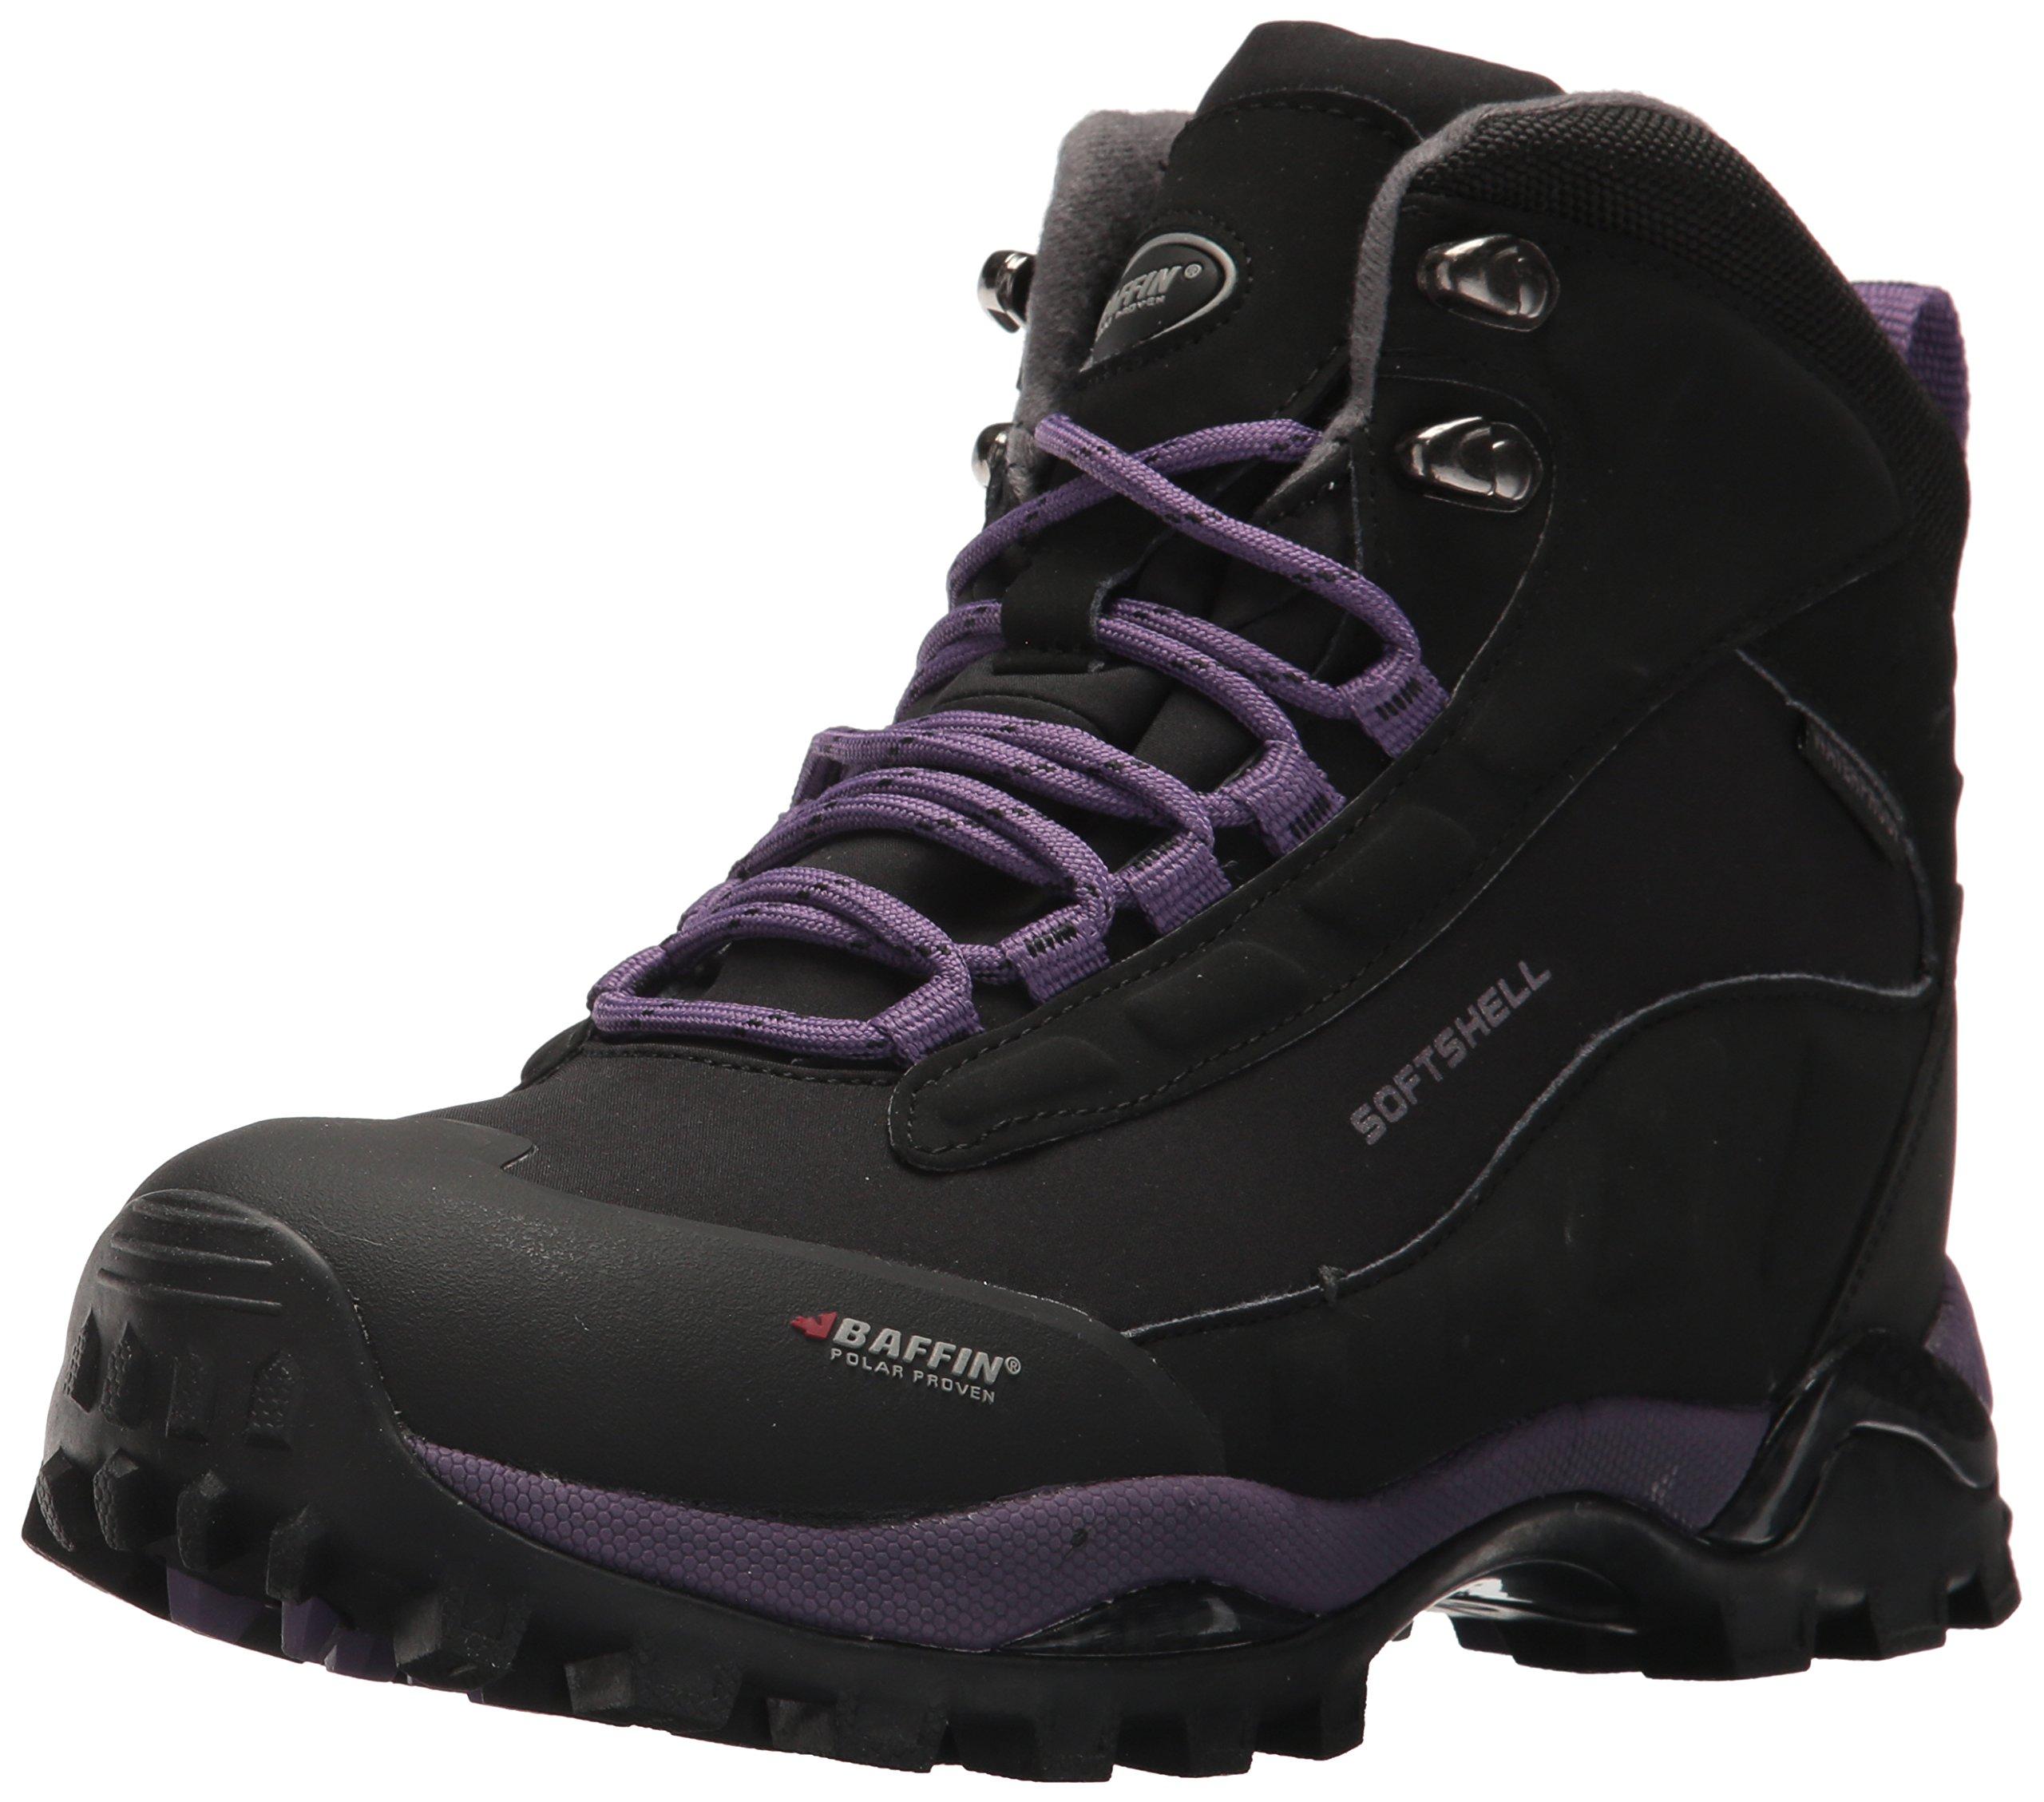 Baffin Women's Hike Hiking Boot,Black/Plum,10 M US